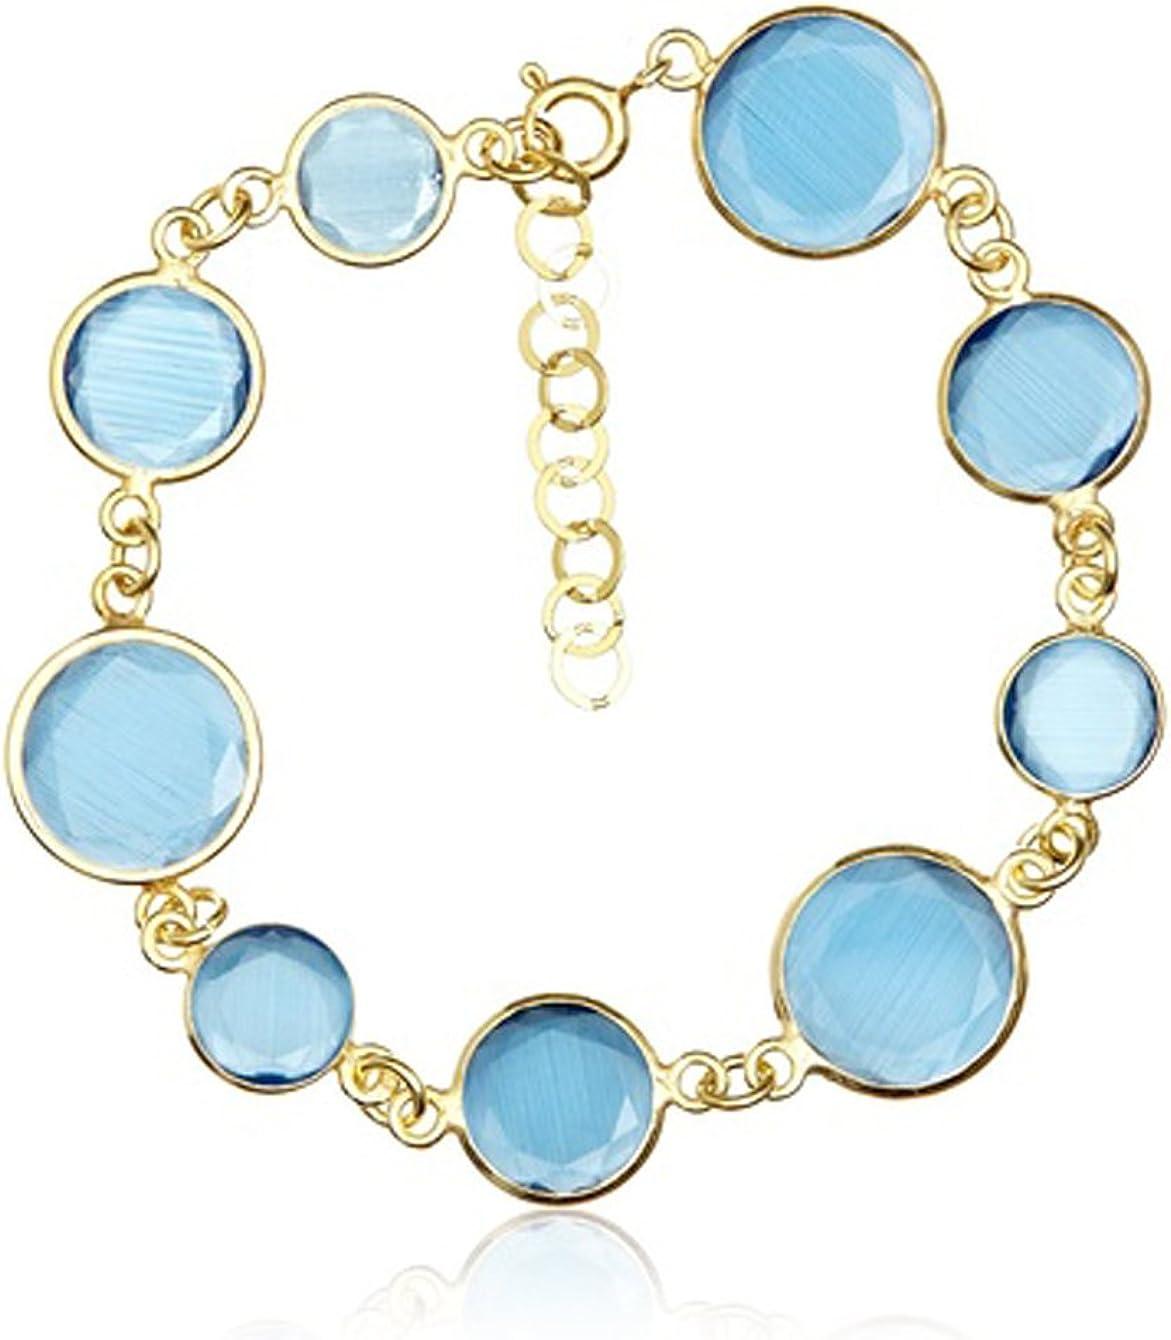 Córdoba Jewels | Pulsera en Plata de Ley 925 bañado en Oro con diseño Fashión Agua Marina